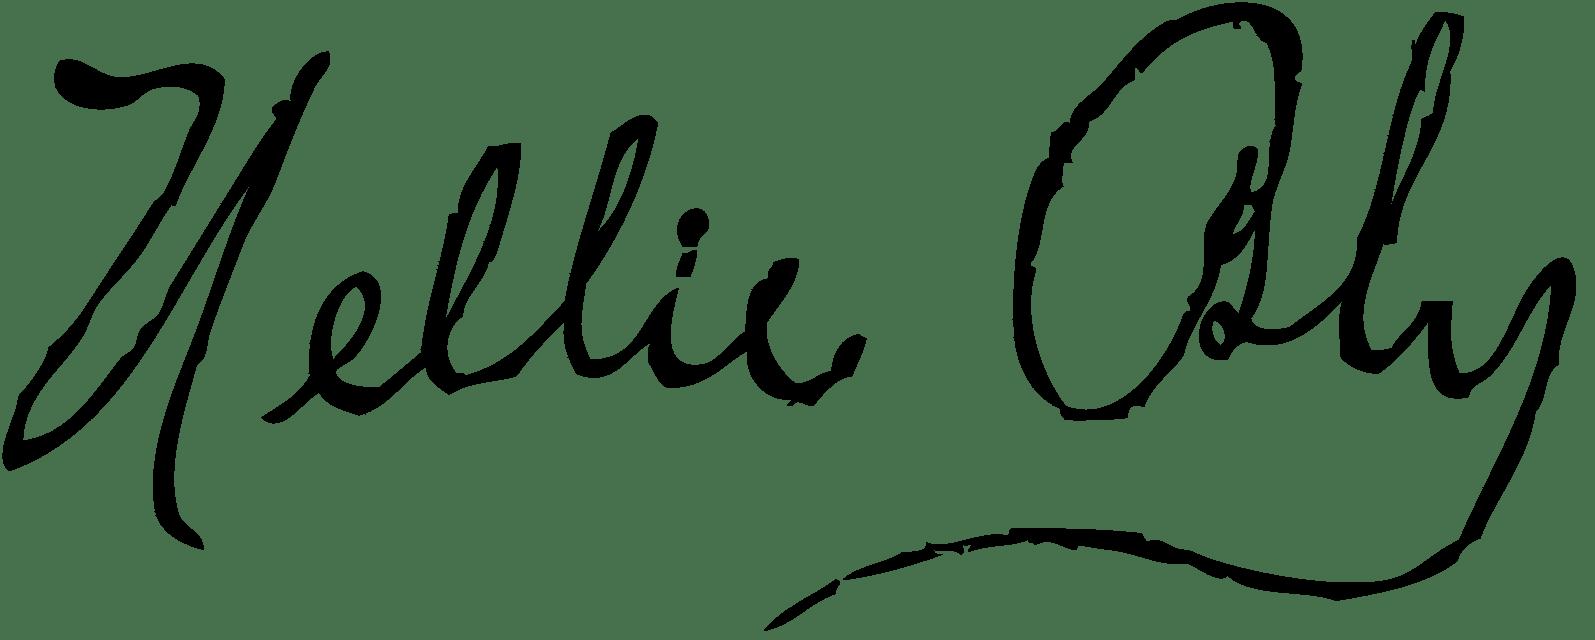 Firma de Nellie Bly